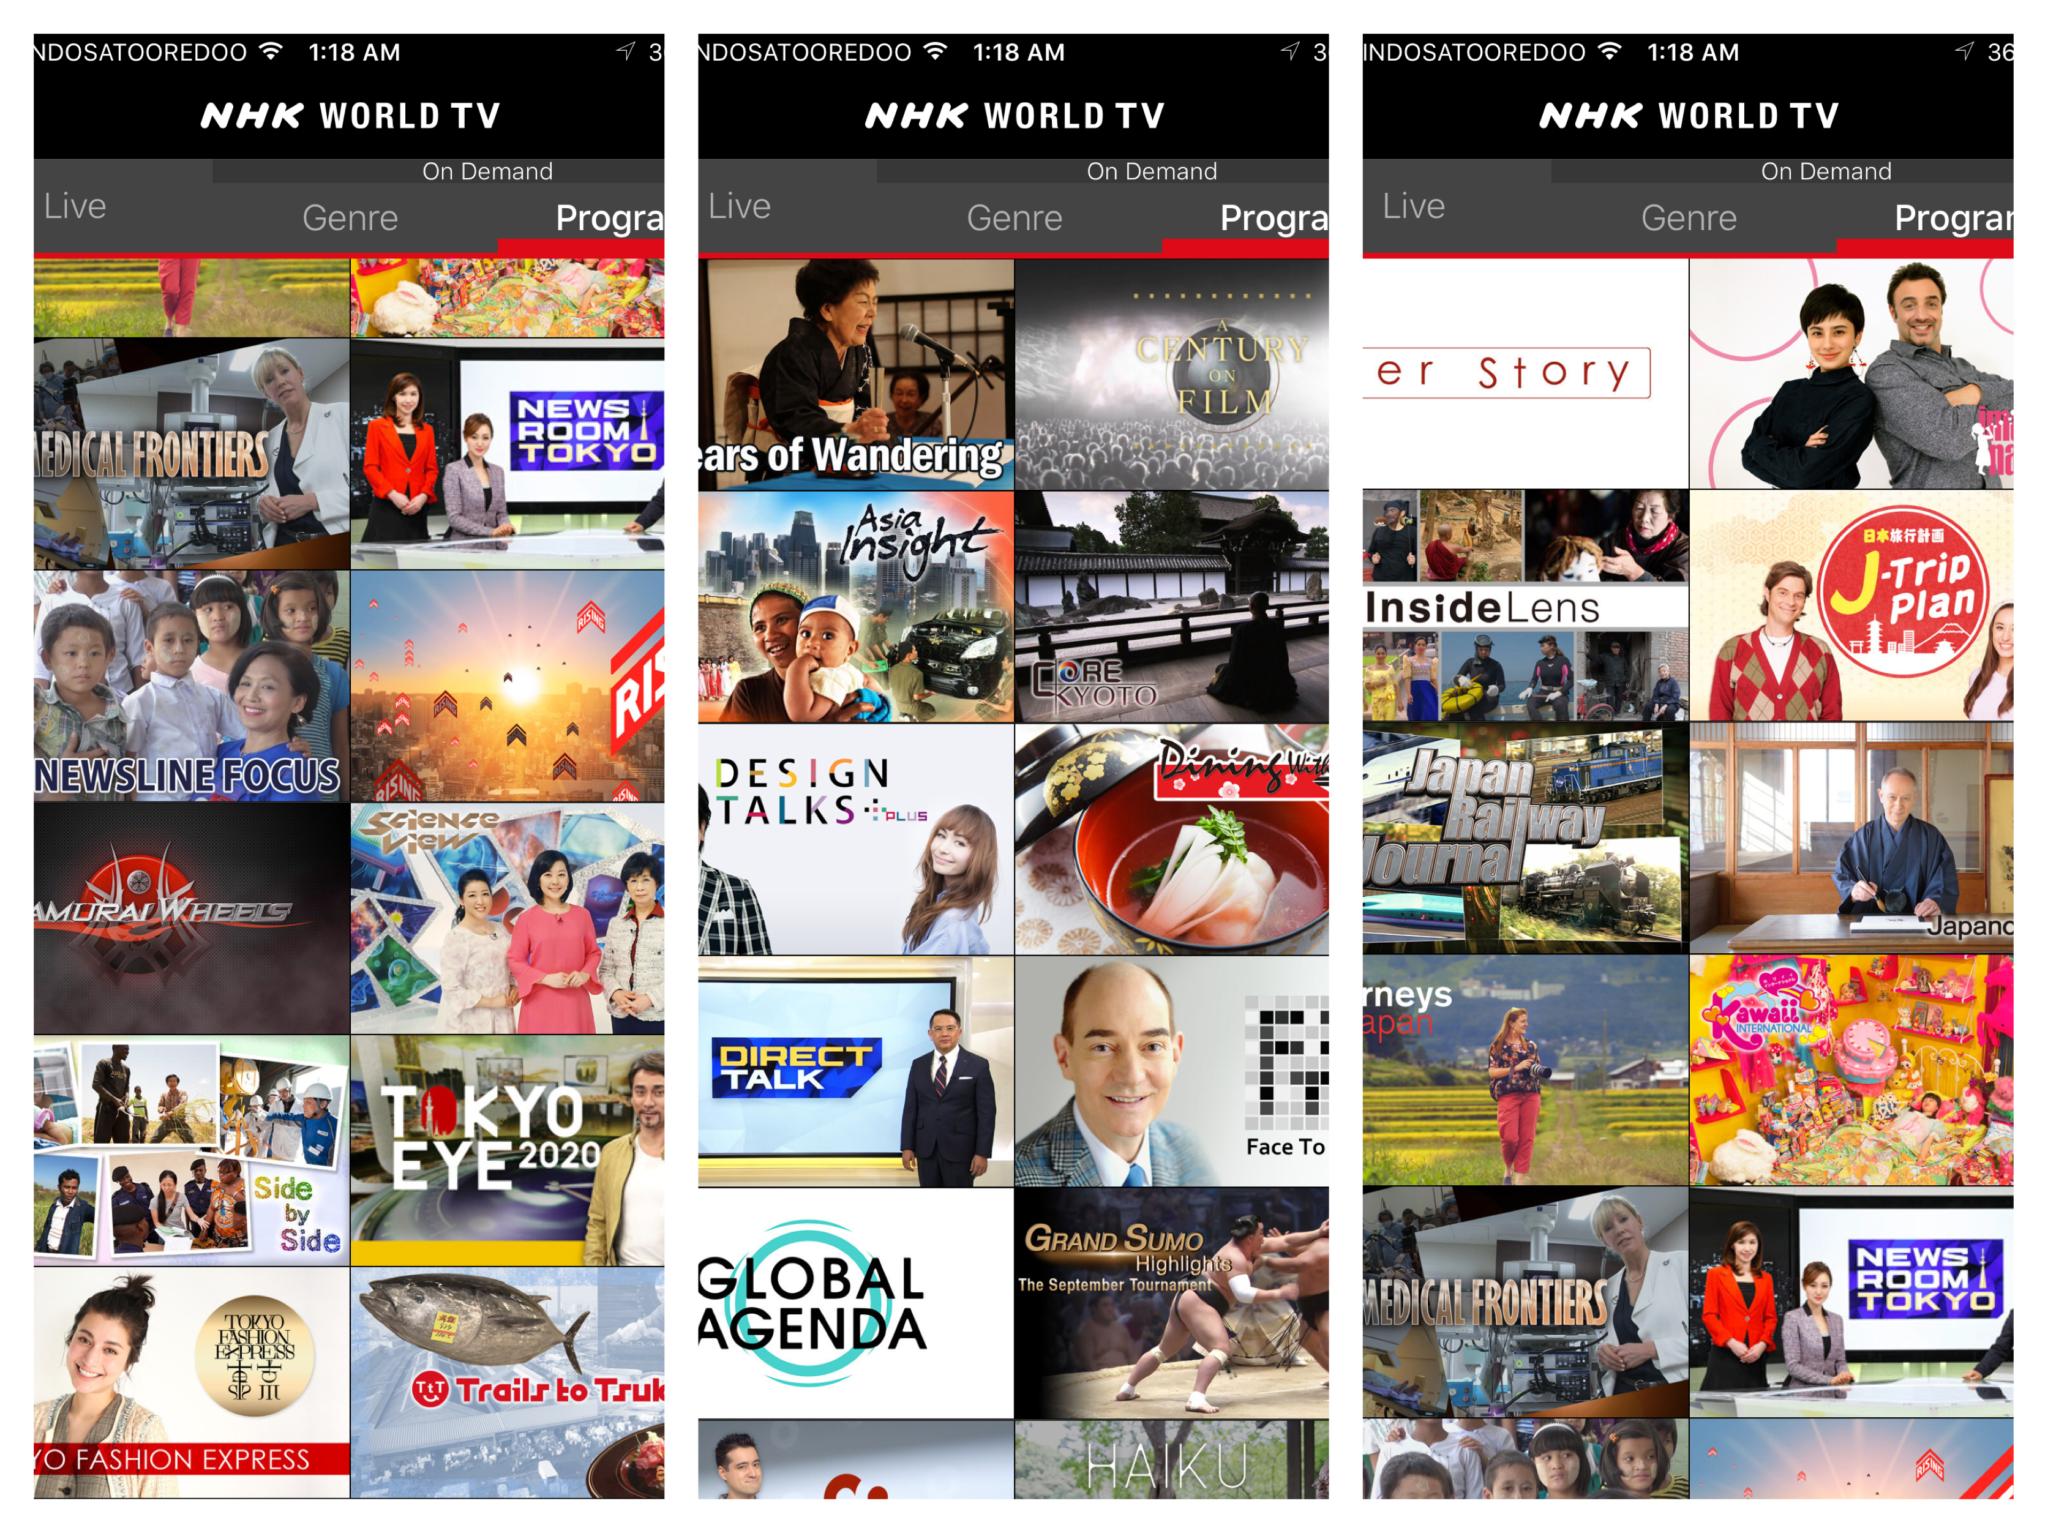 NHK World, NHK World Japan, Domonhk, Domo, Jepang, Japan, Streaming